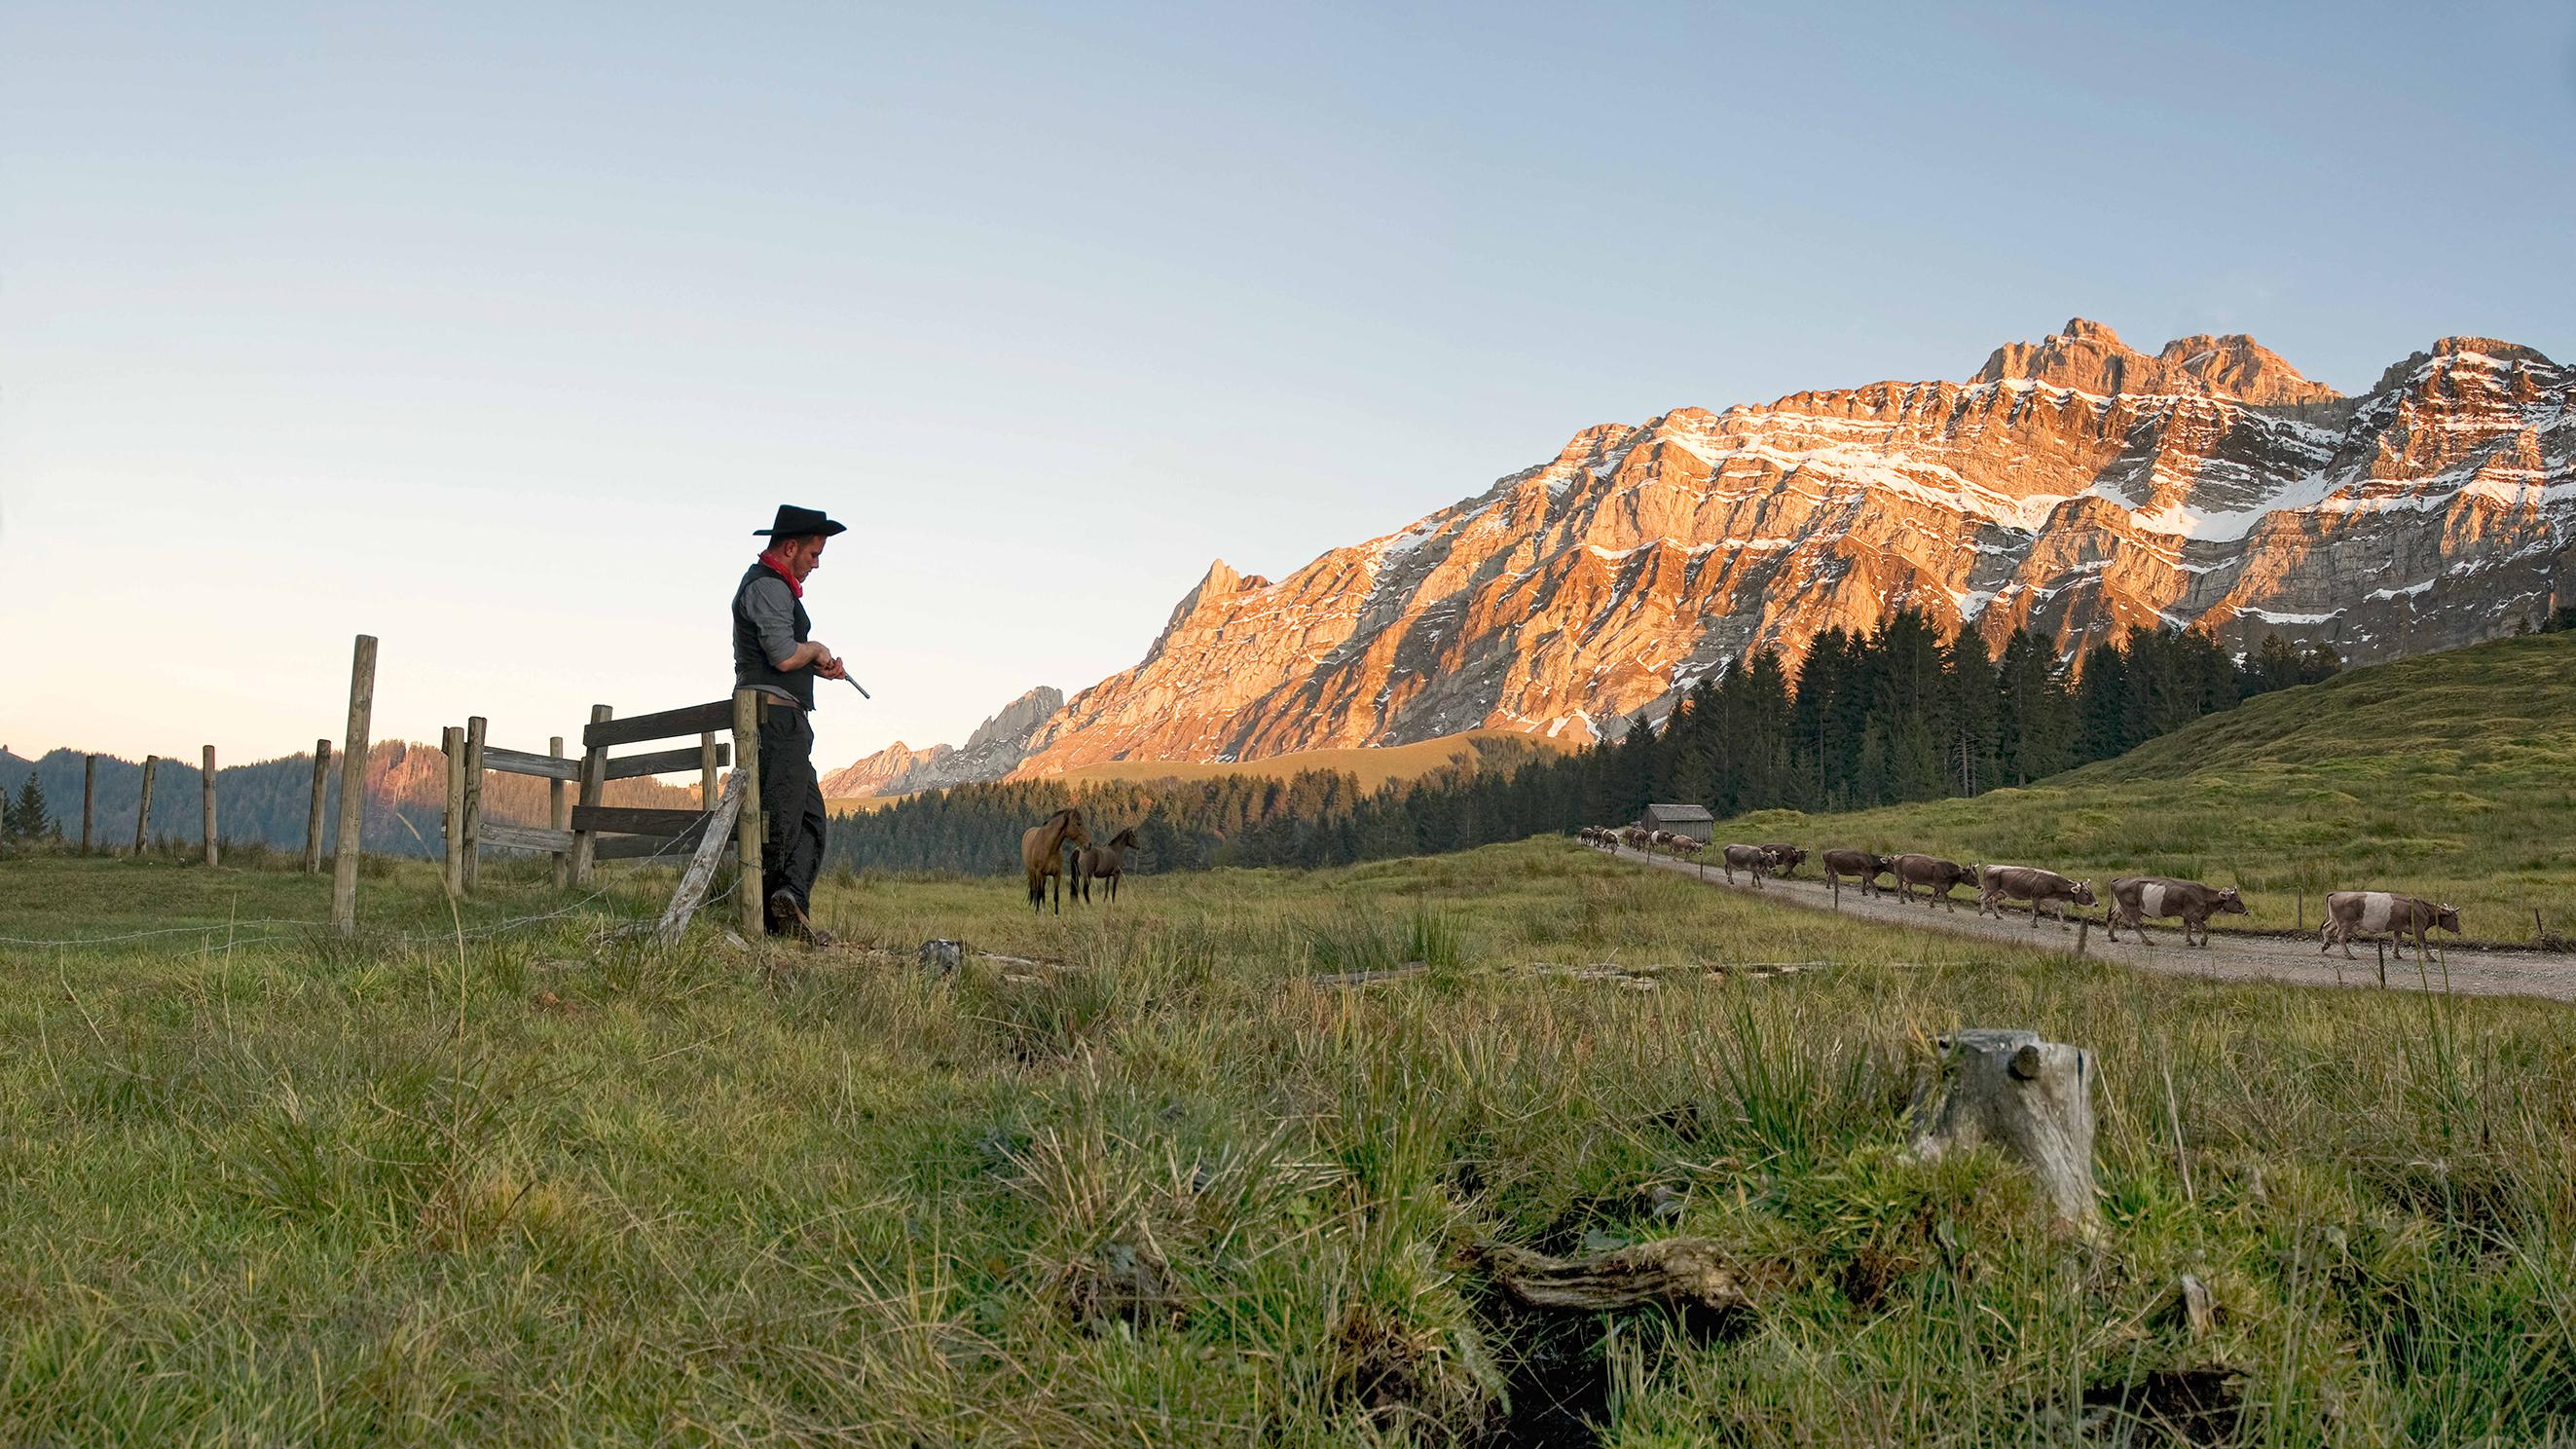 Cowboy1_cine 100x56_print_A